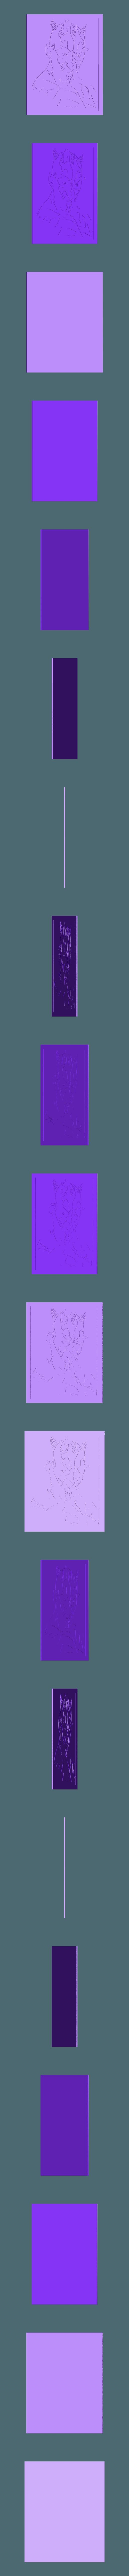 StarWars_Darth_Maul_v1.stl Télécharger fichier STL gratuit StarWars - Dark Maul • Design pour imprimante 3D, yb__magiic